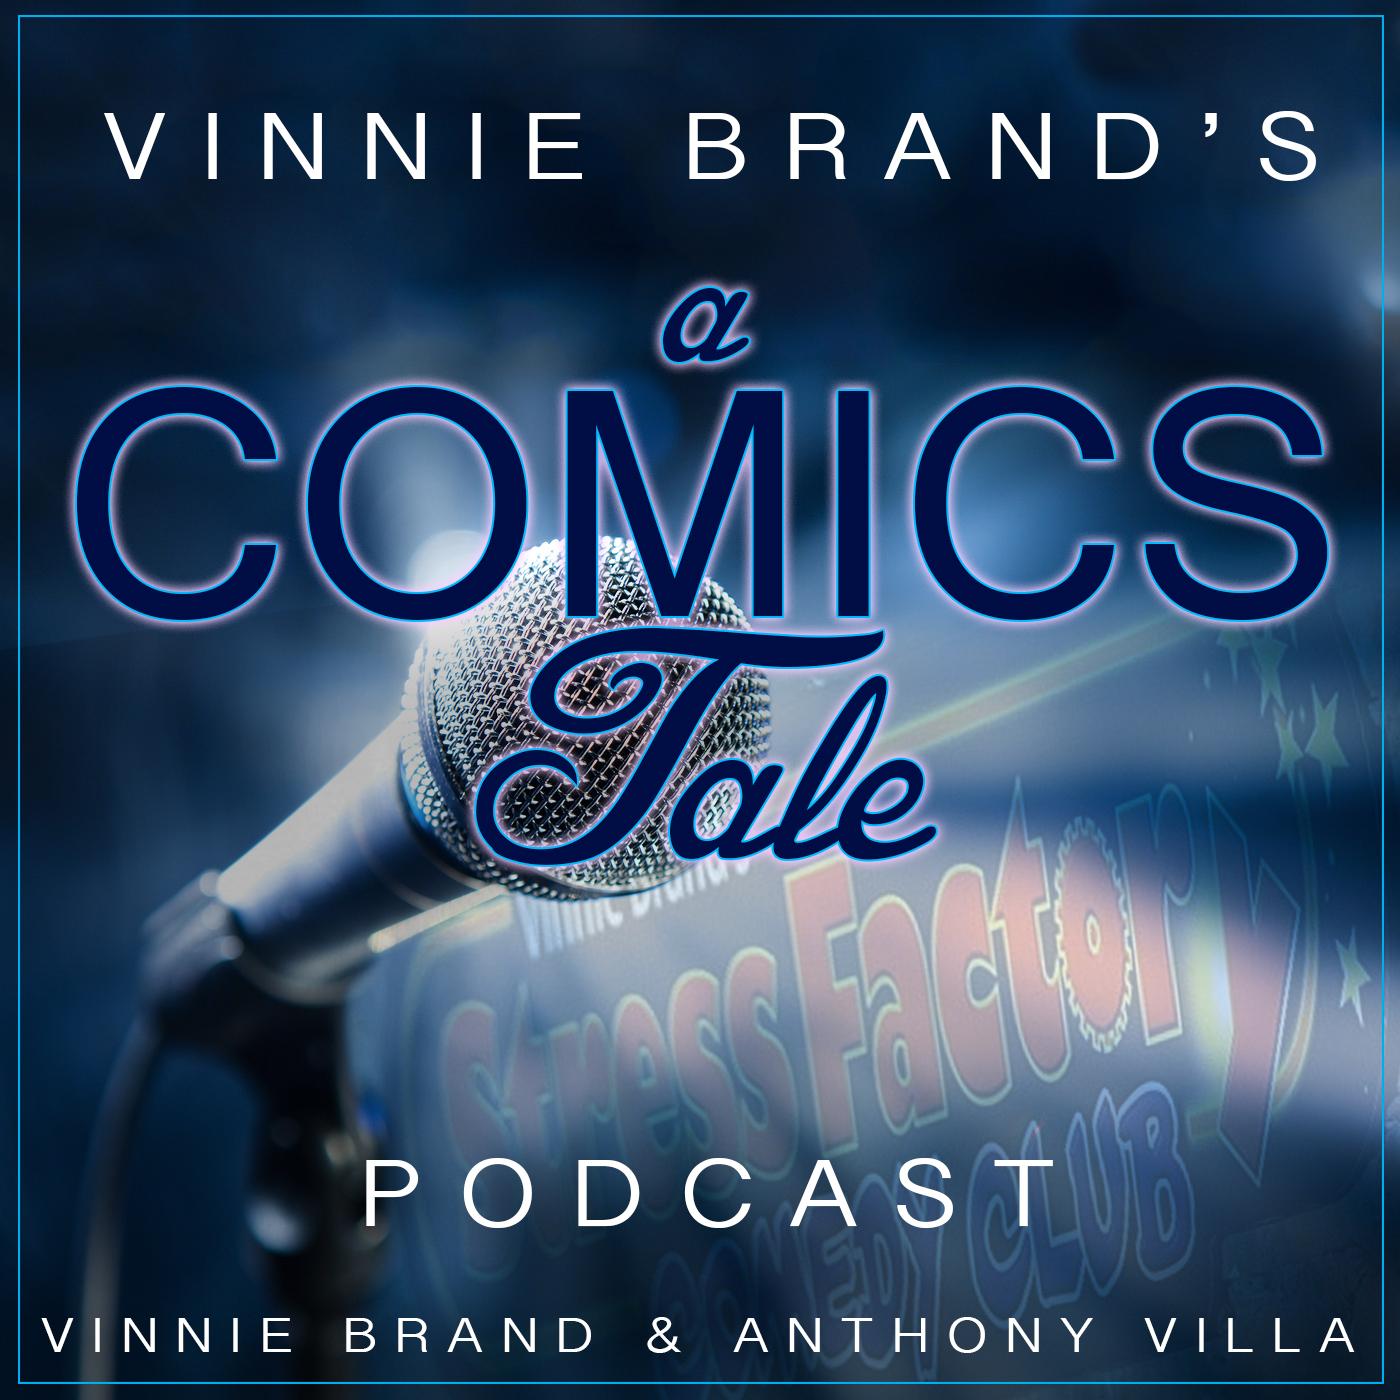 Vinnie Brand's A Comic's Tale